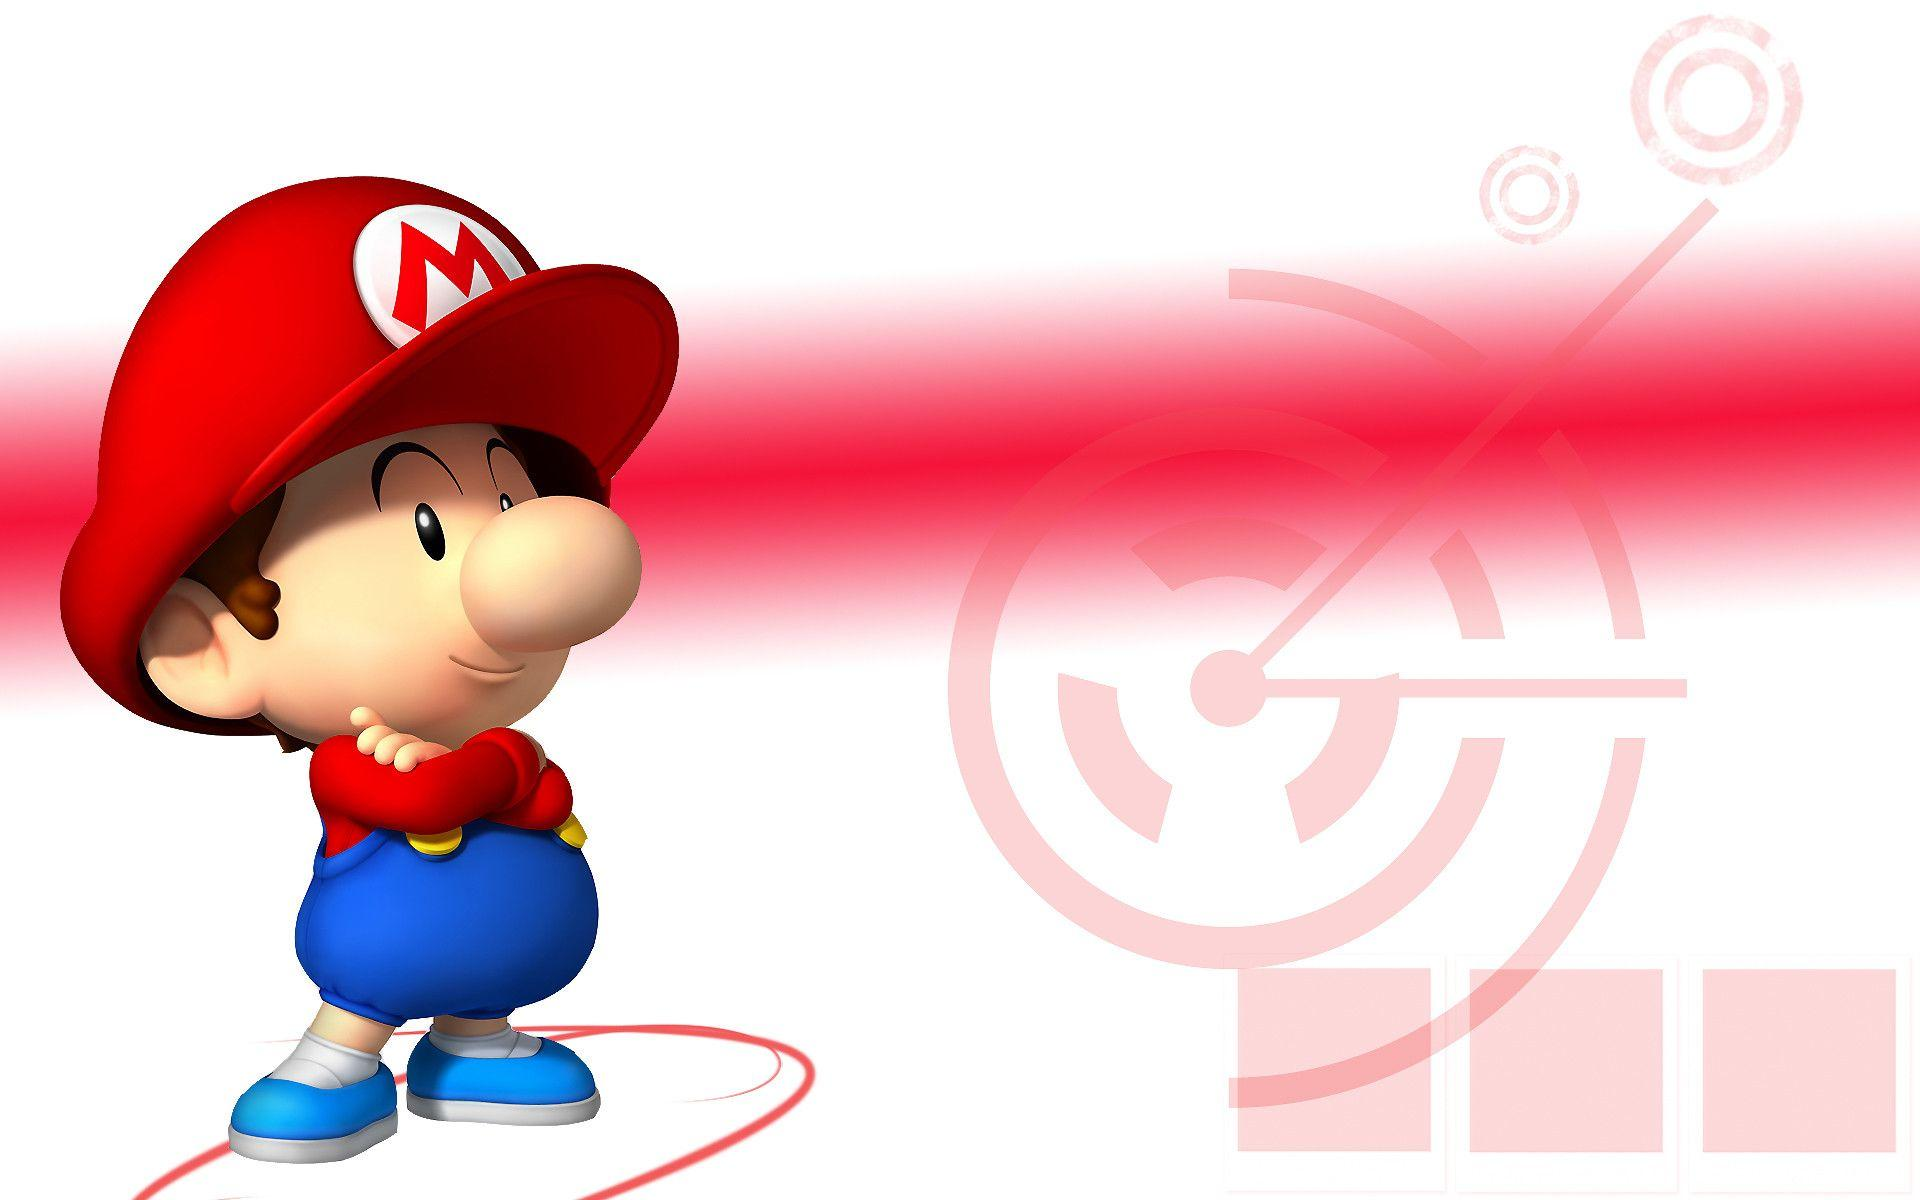 DeviantArt: More Like Baby Mario Wallpaper by linkintek06